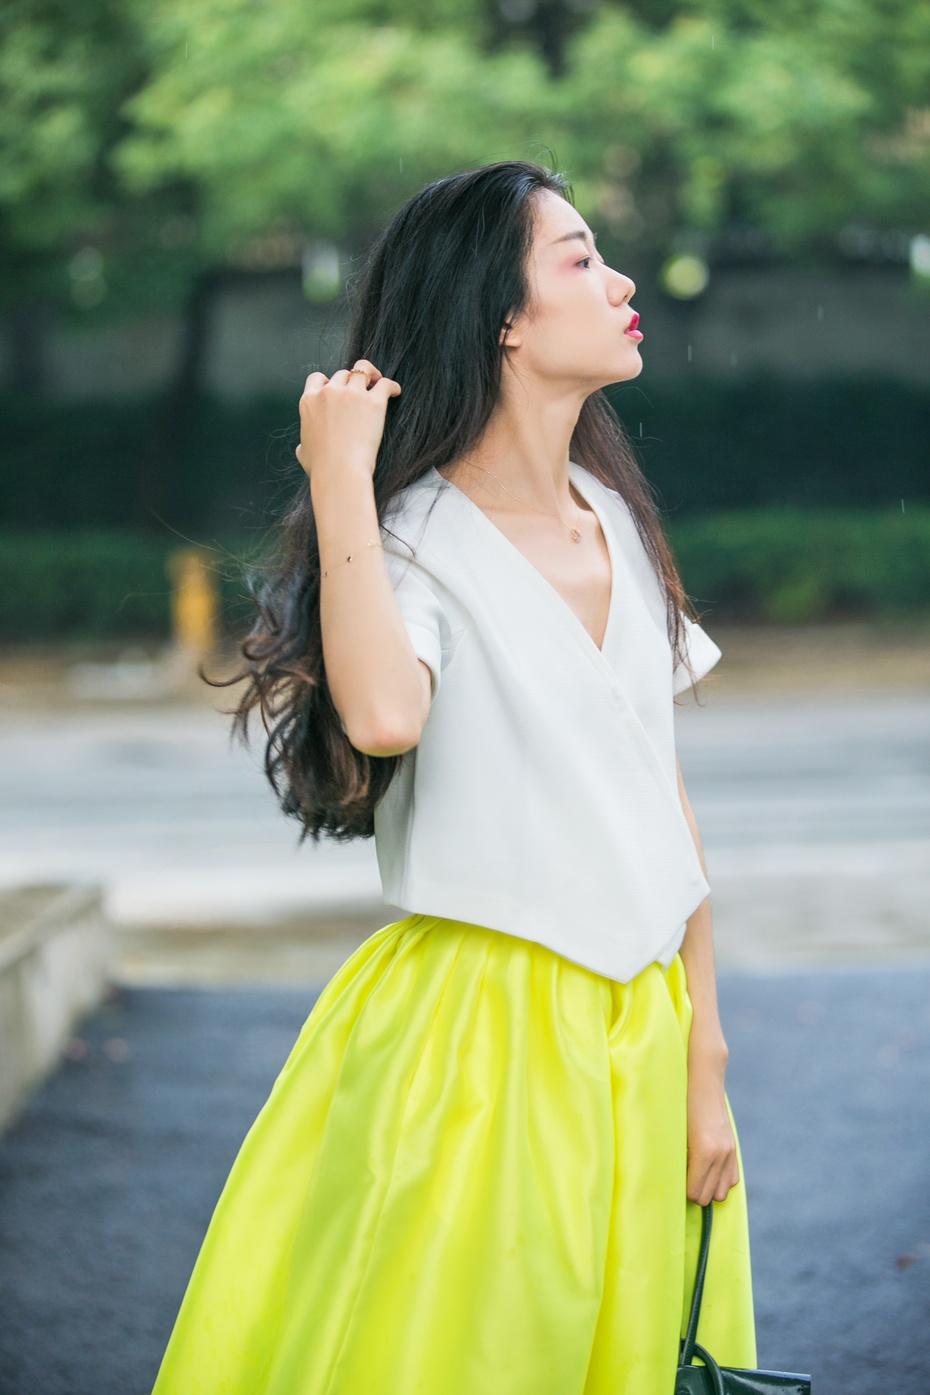 [Ava搭配周记]告别无趣,半裙要这么穿! - AvaFoo - Avas Fashion Blog